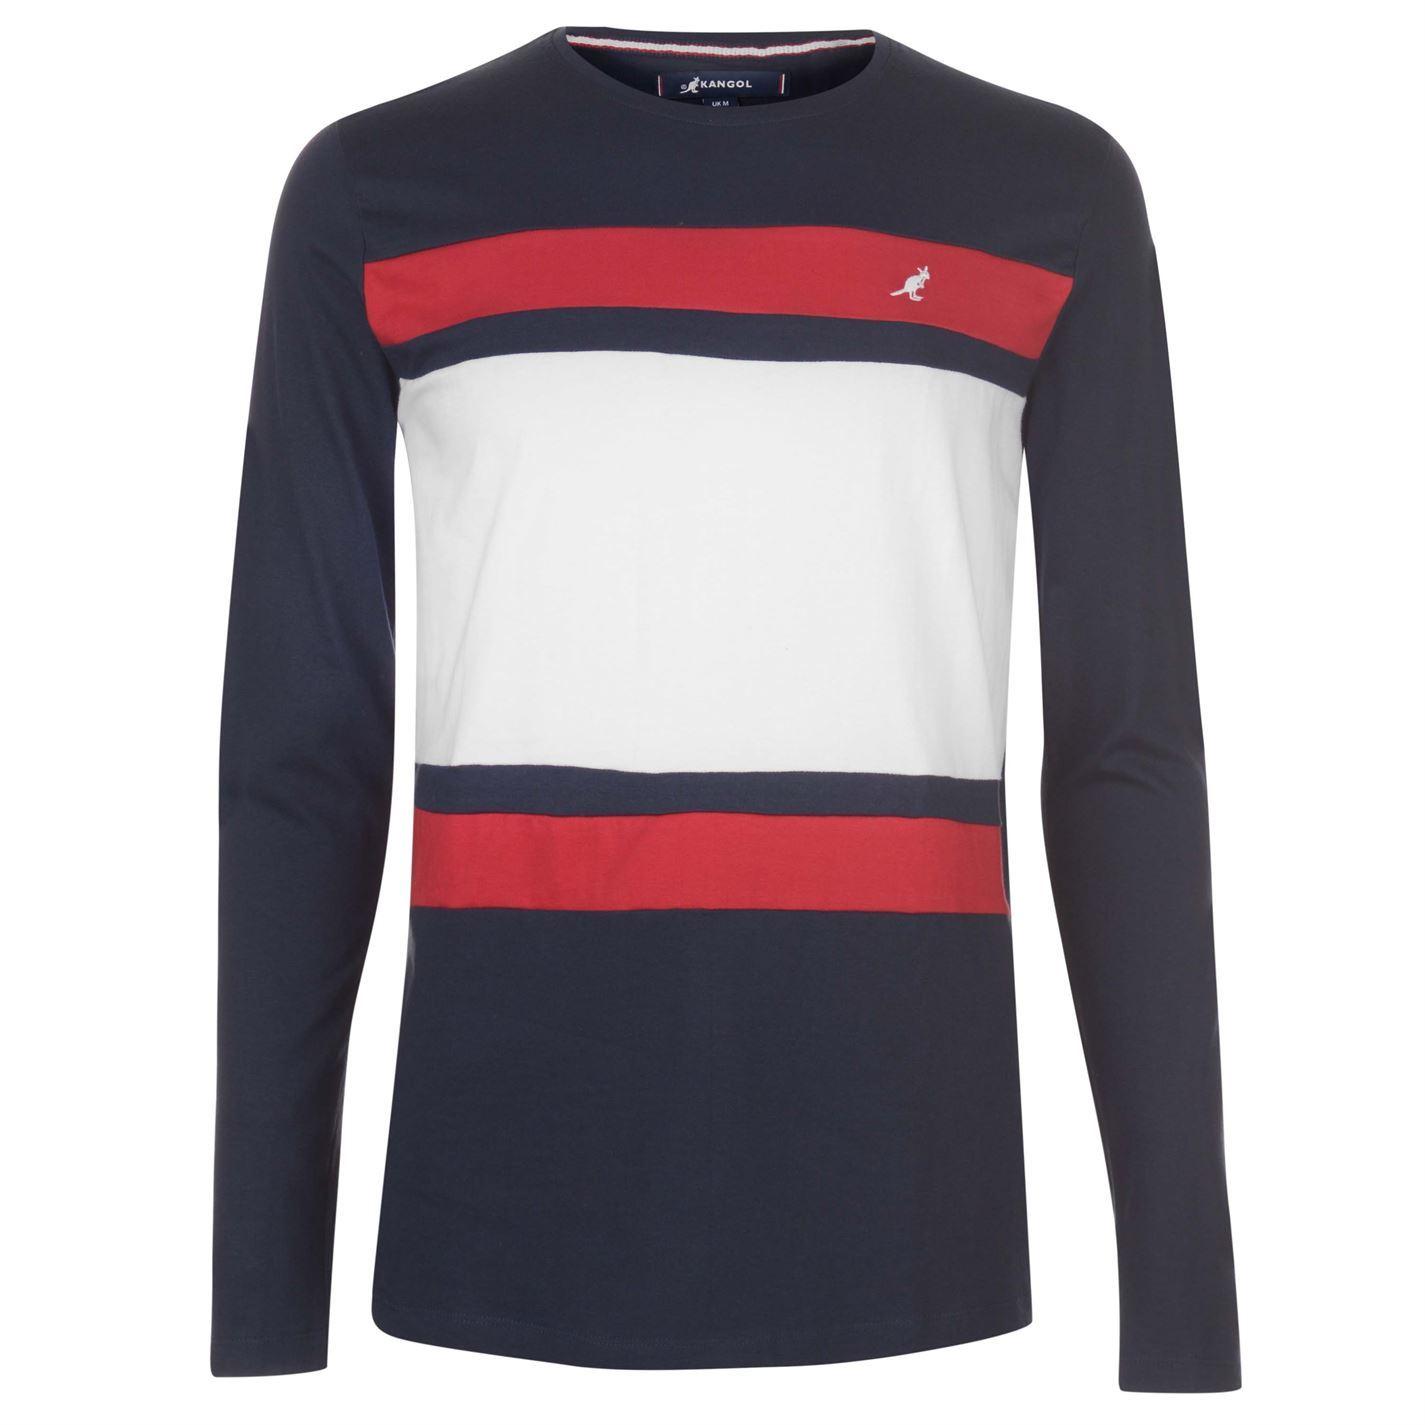 Kangol-Long-Sleeve-T-Shirt-Mens-Tee-Shirt-Top thumbnail 11